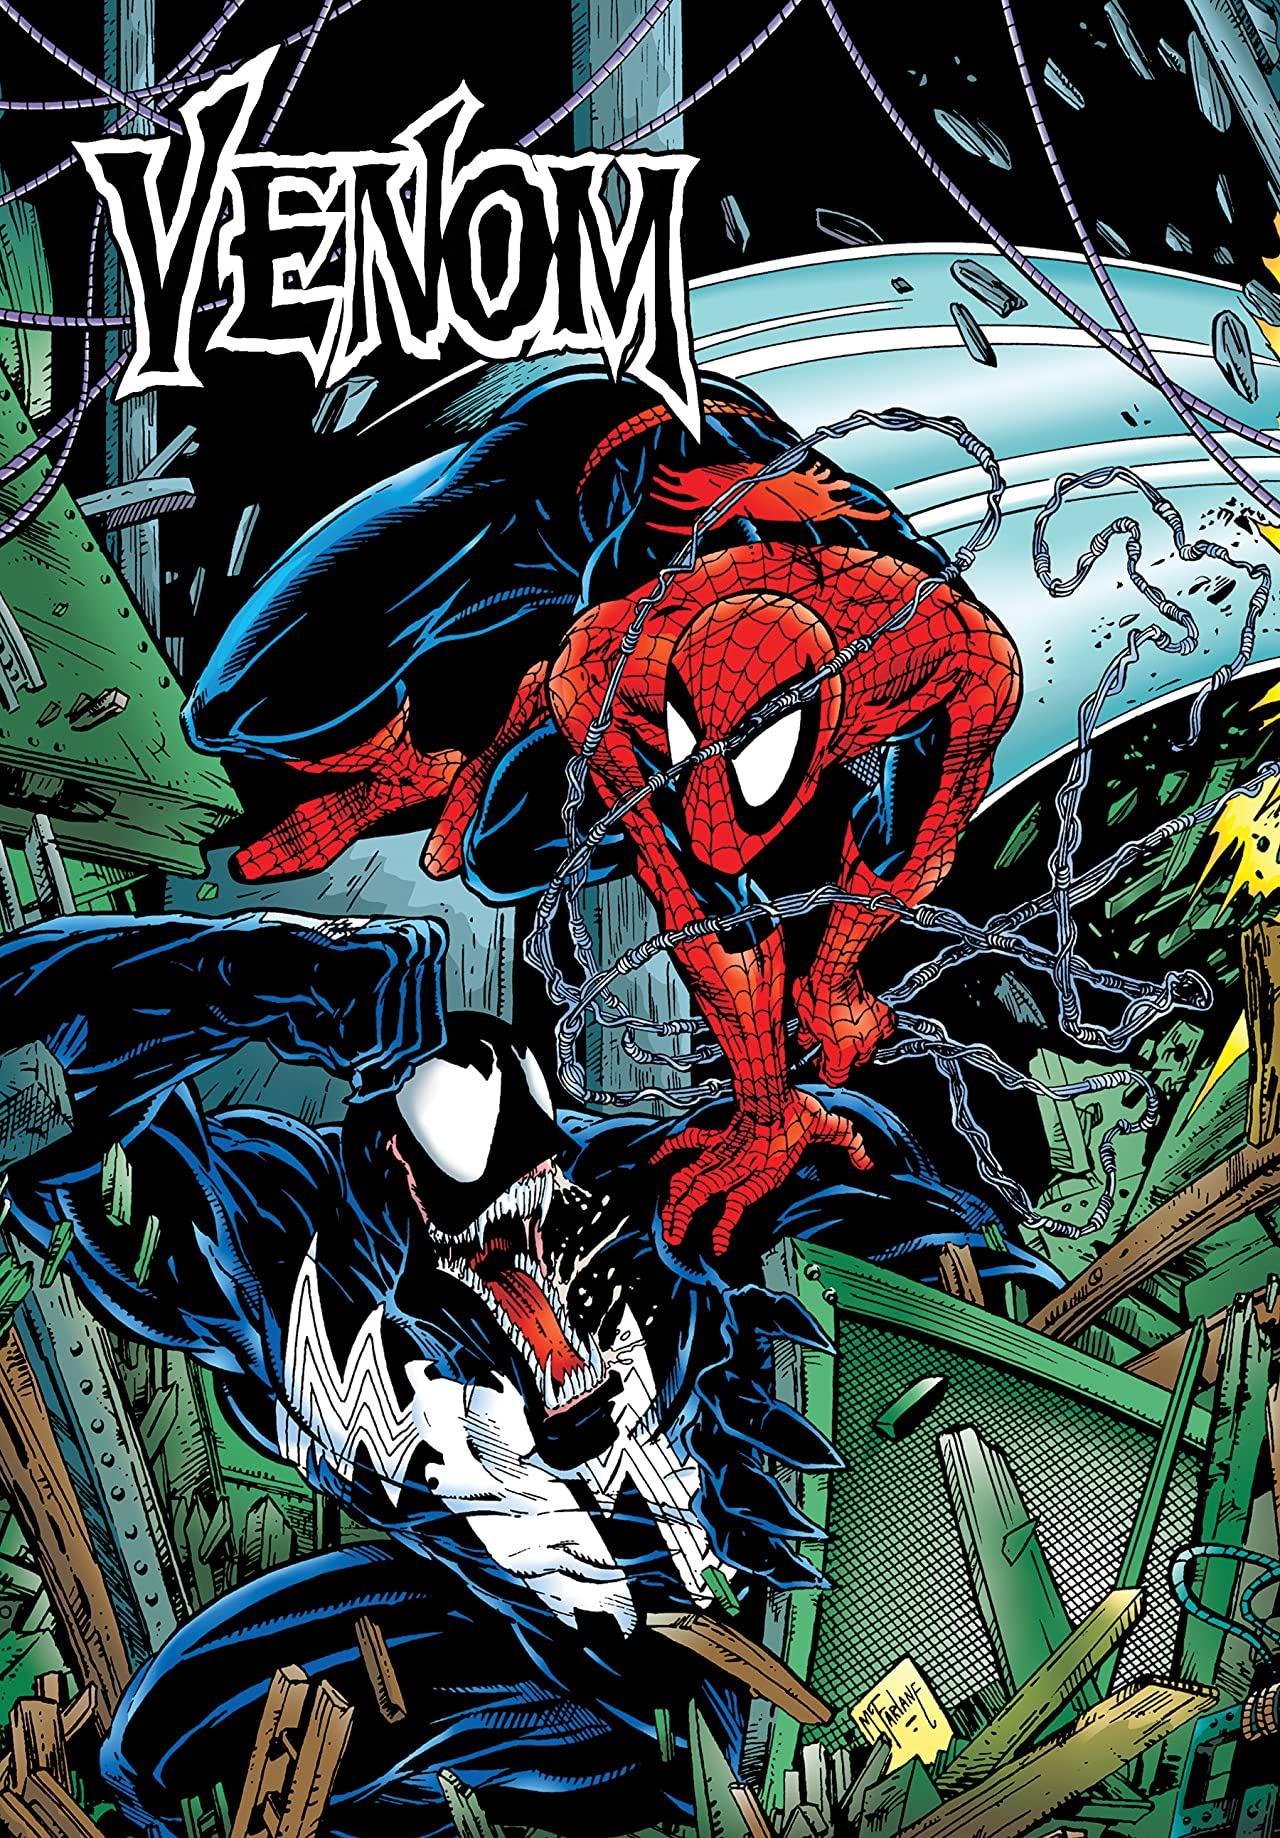 Venom by Michelinie & McFarlane (Hardcover)